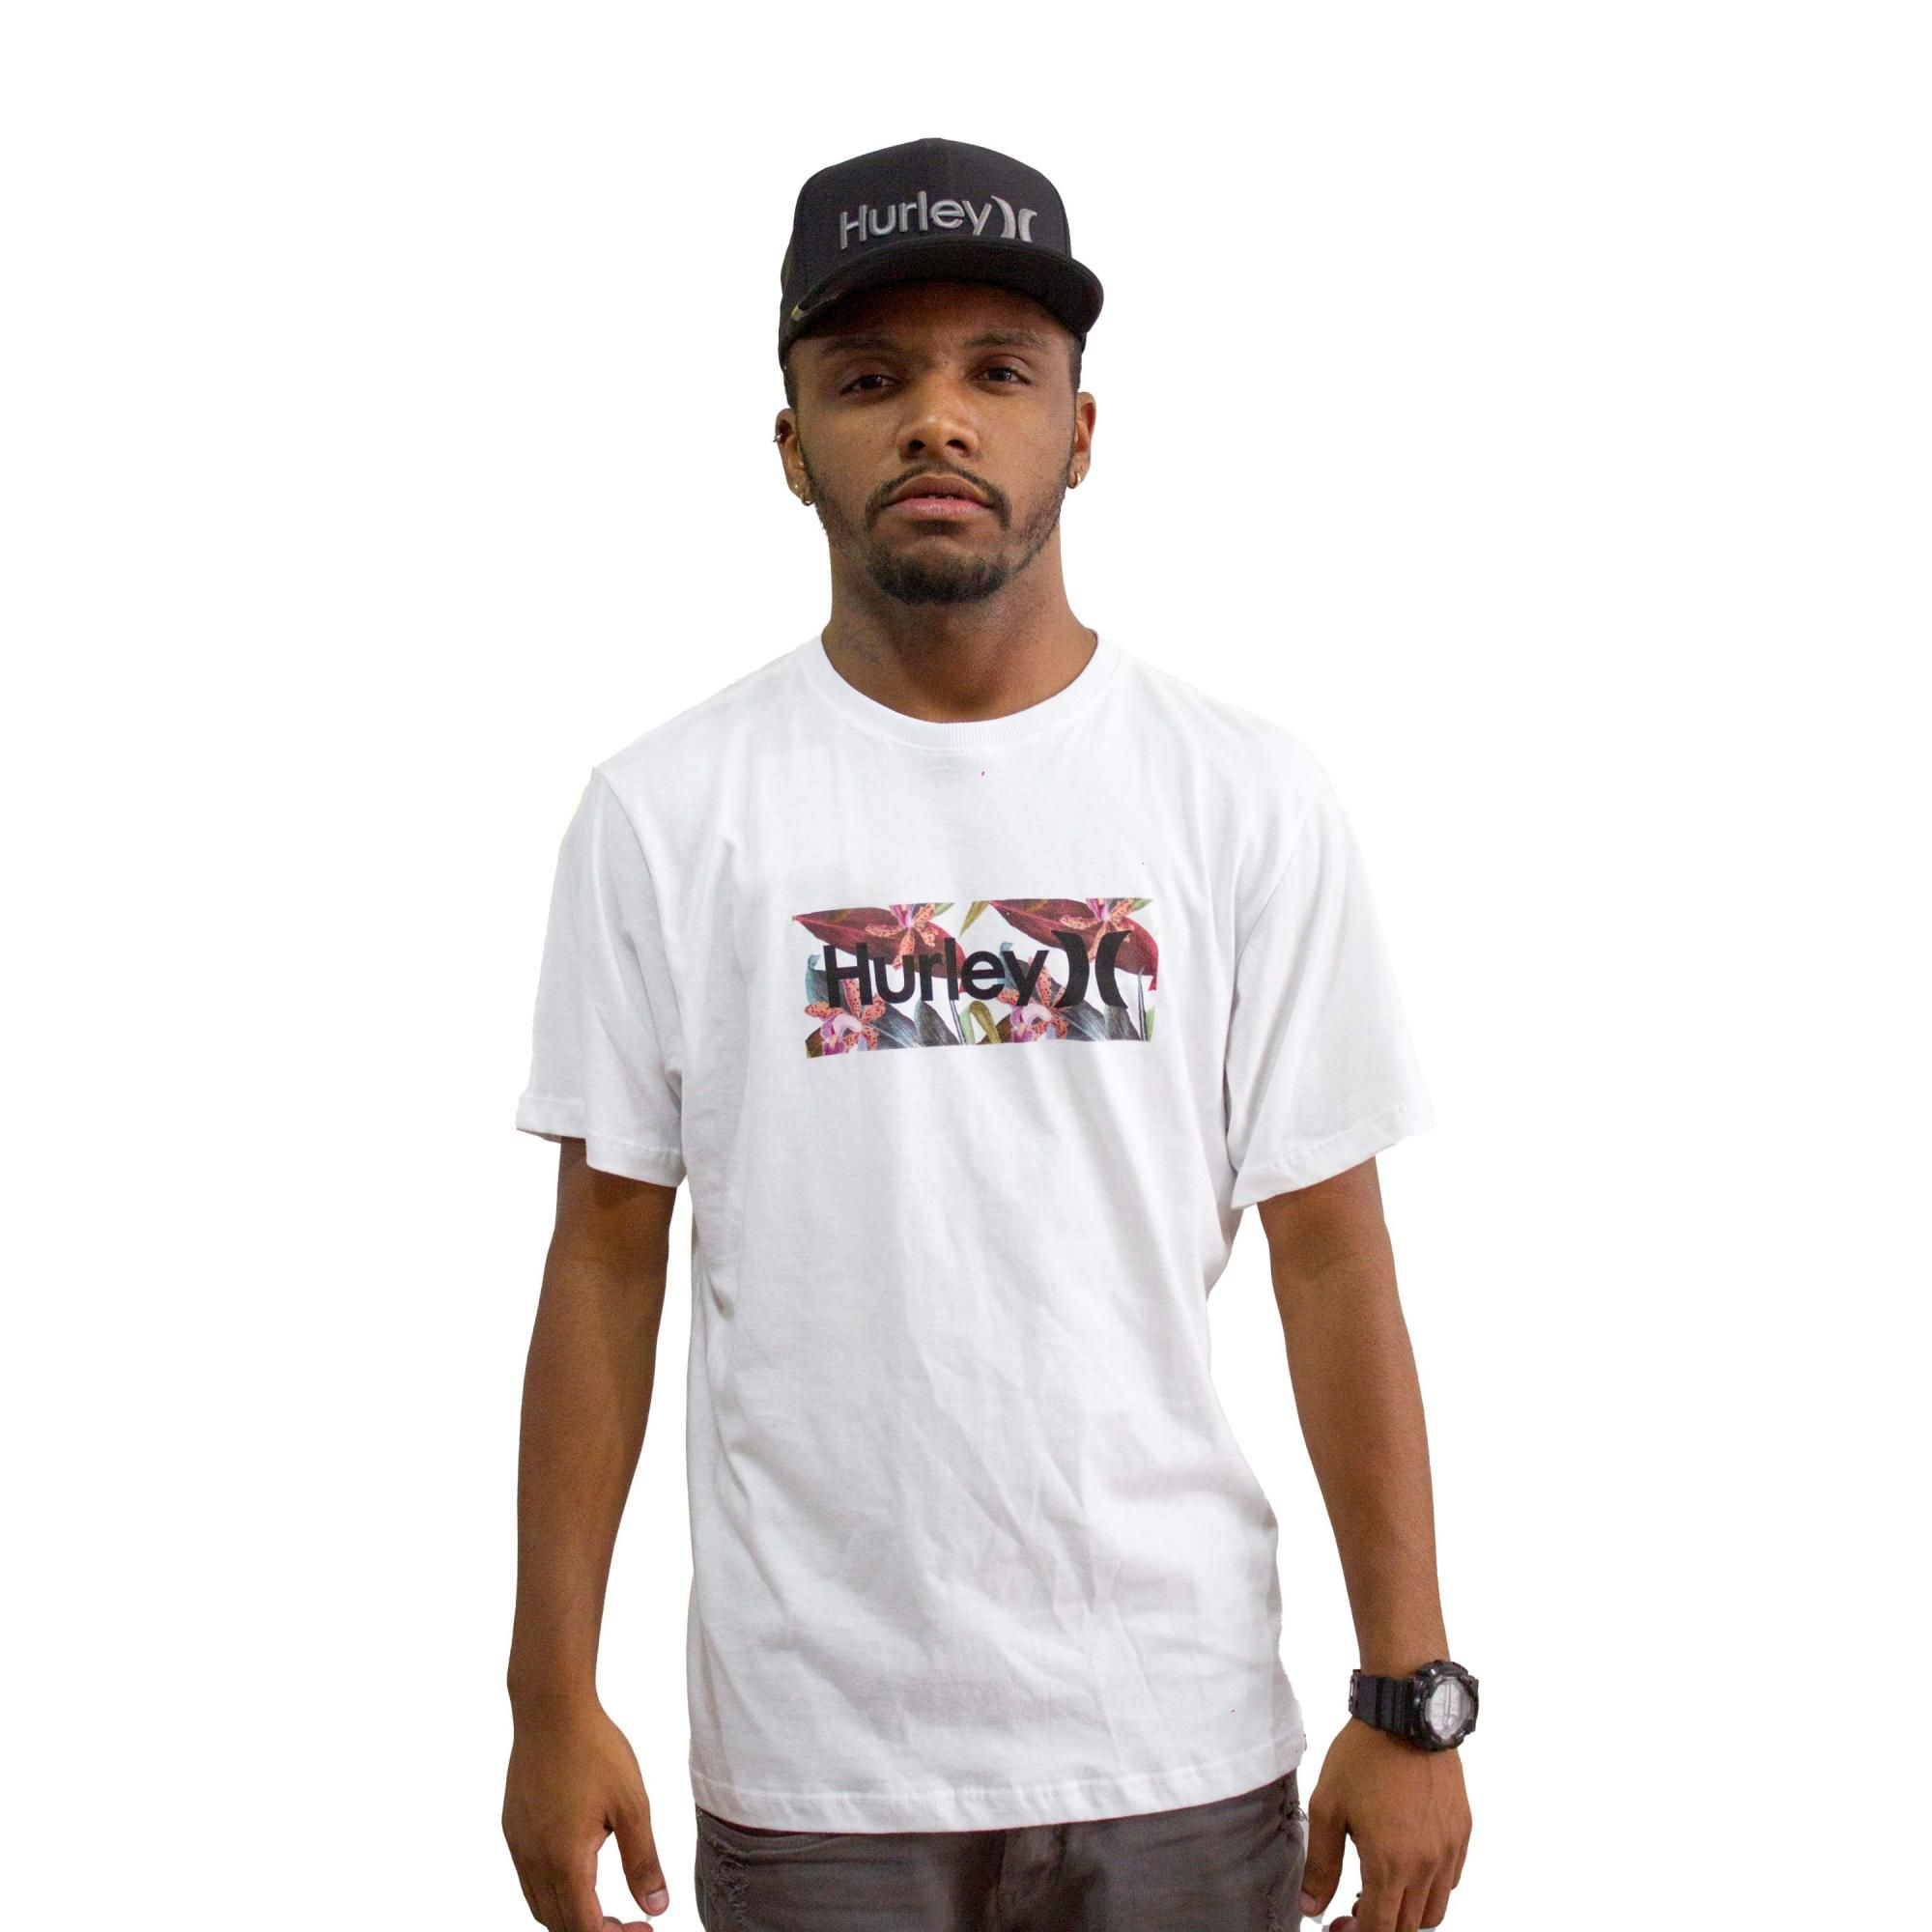 Camiseta Hurley Silk Branca